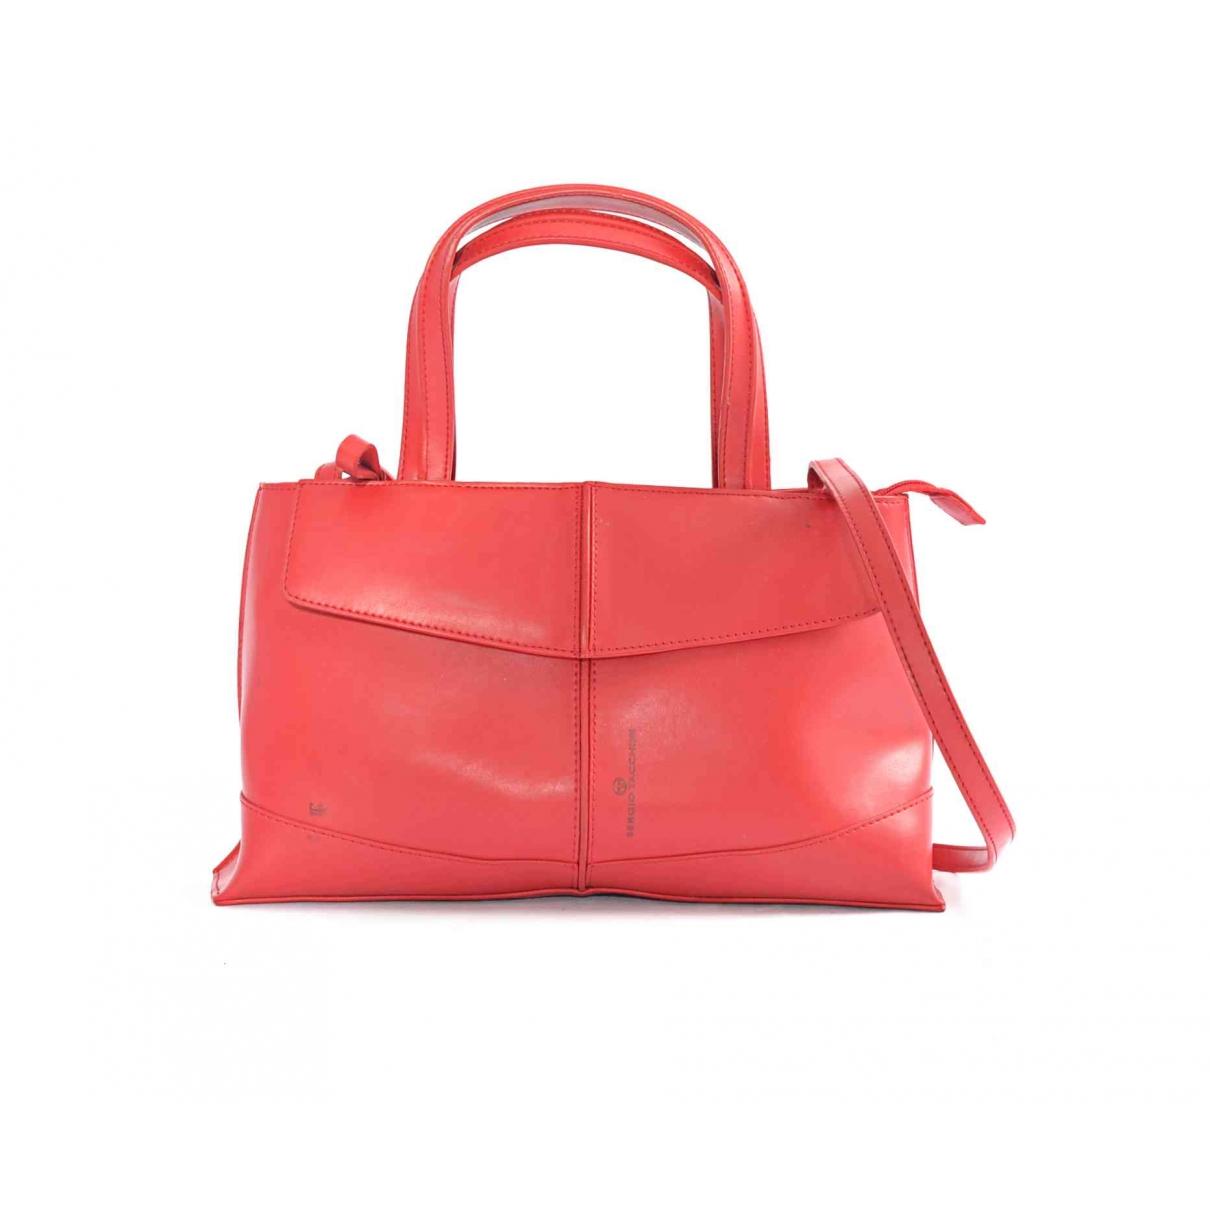 Sergio Tacchini \N Handtasche in  Rot Leder